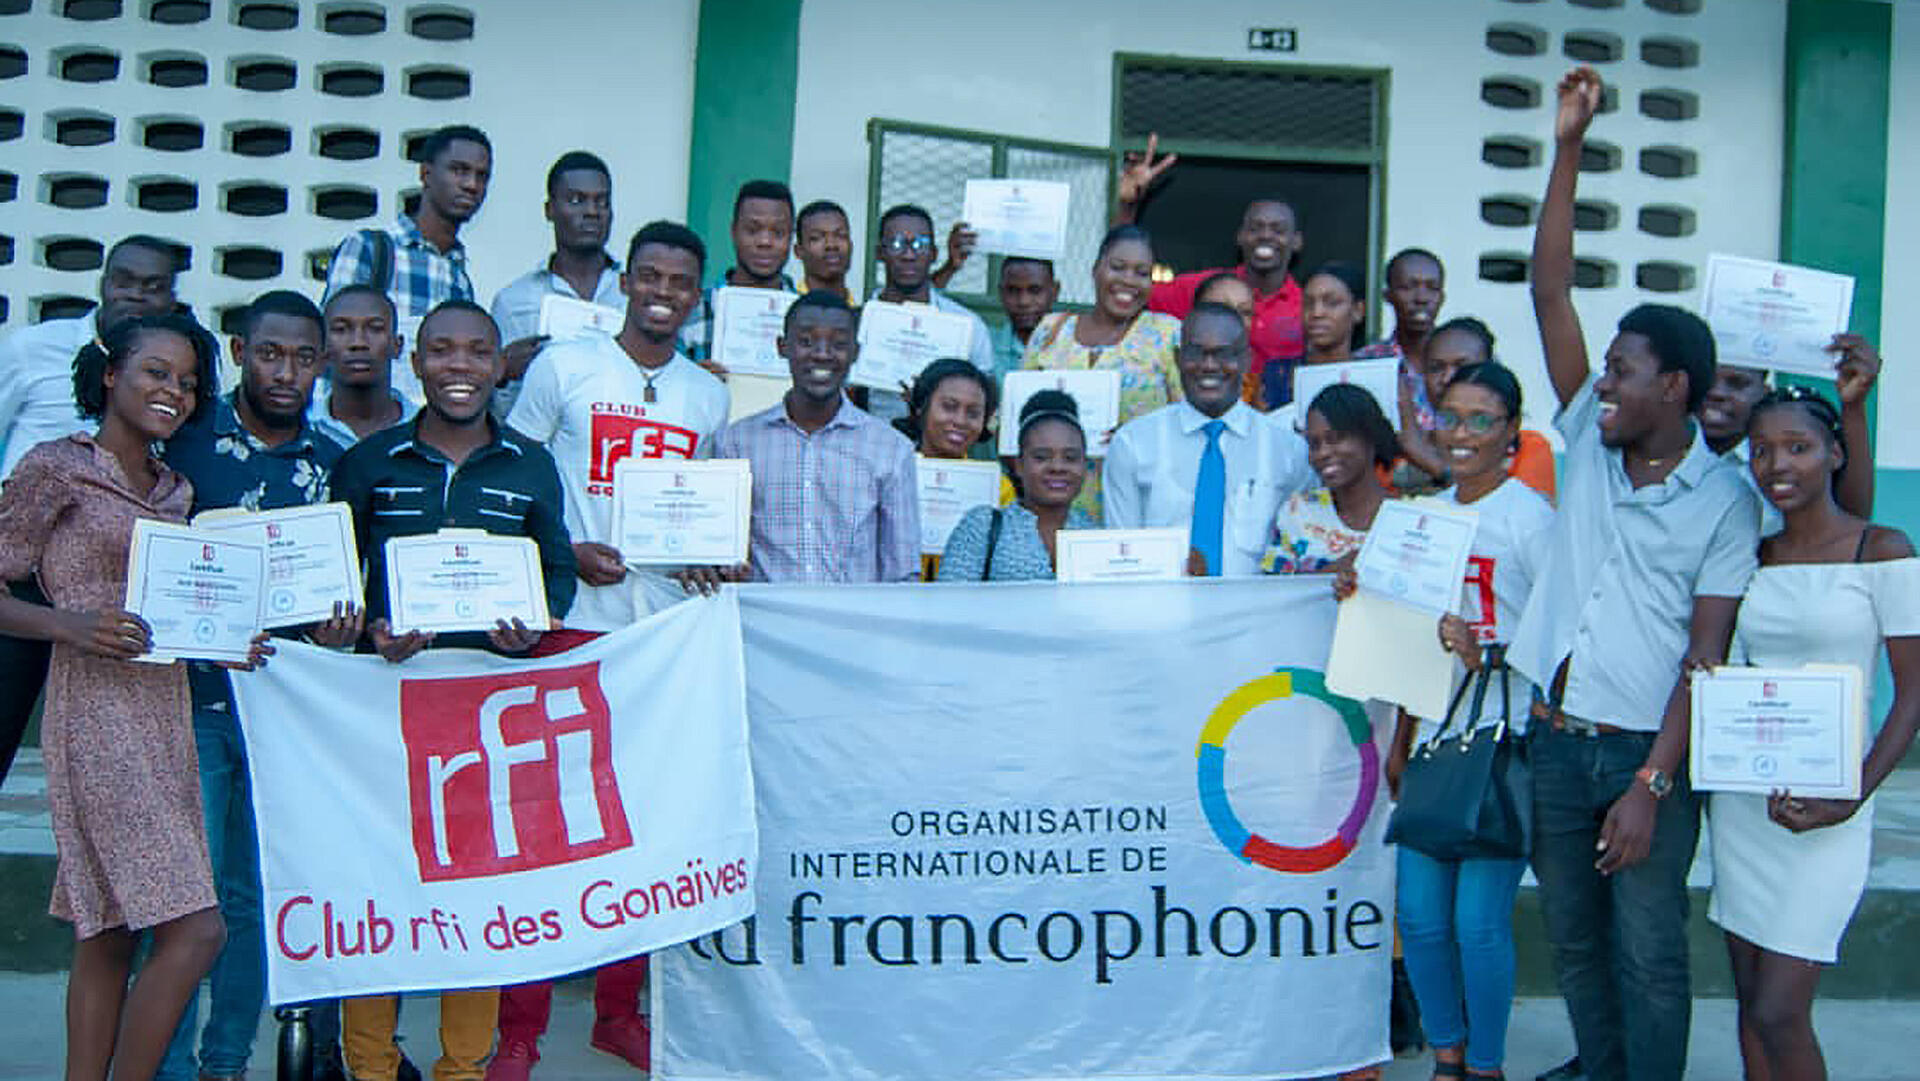 Haïti - Club RFI Gonaïves - participants de la formation